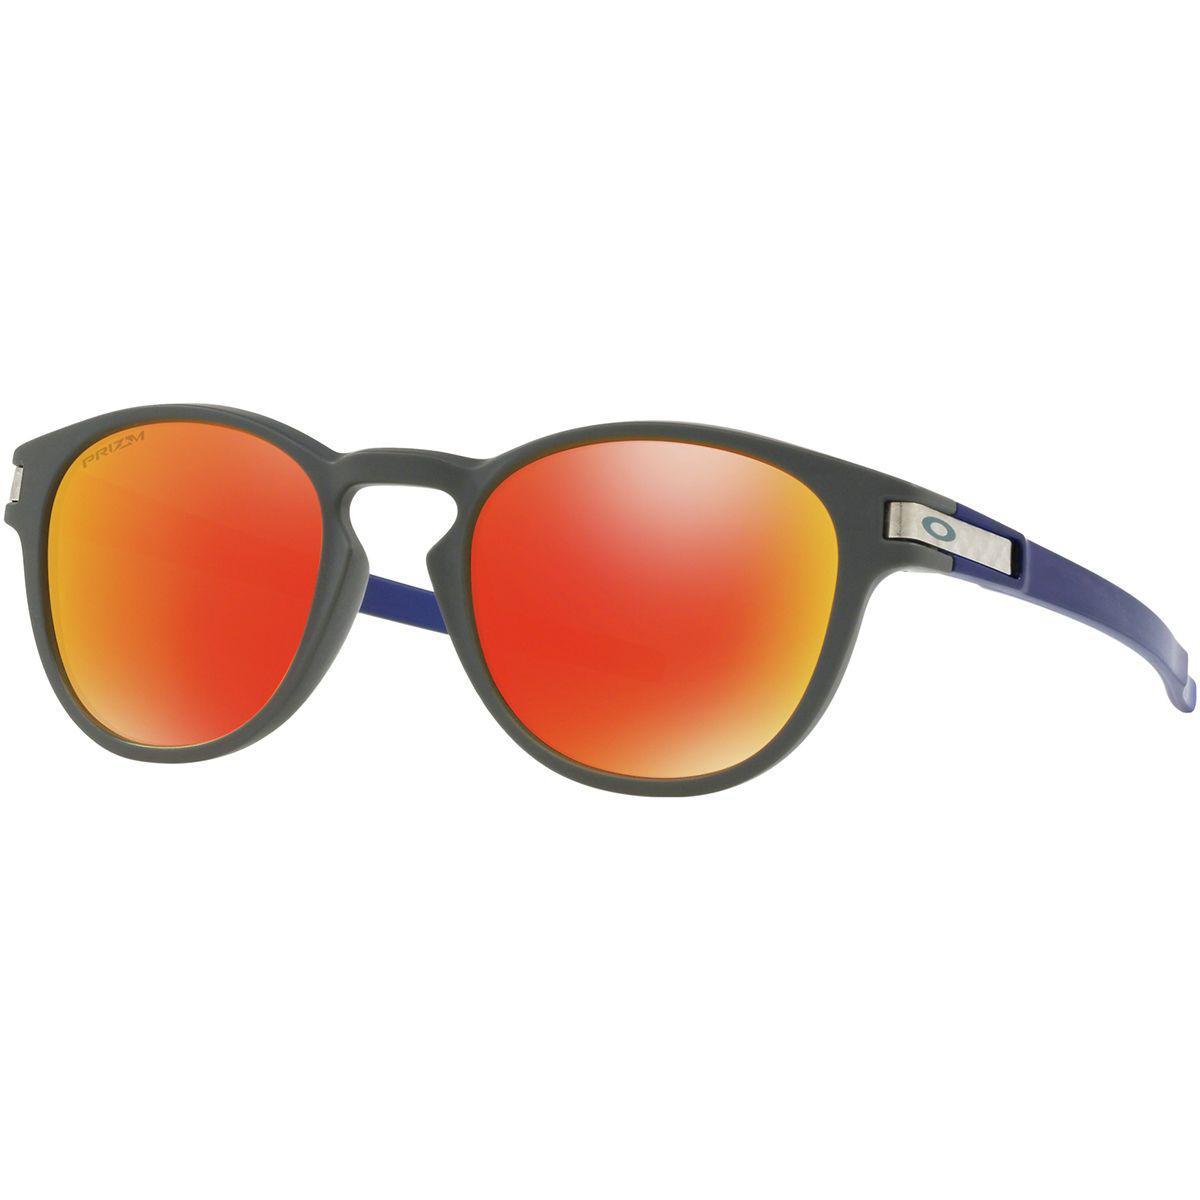 0578d39e1c Lyst - Oakley Latch Prizm Sunglasses for Men